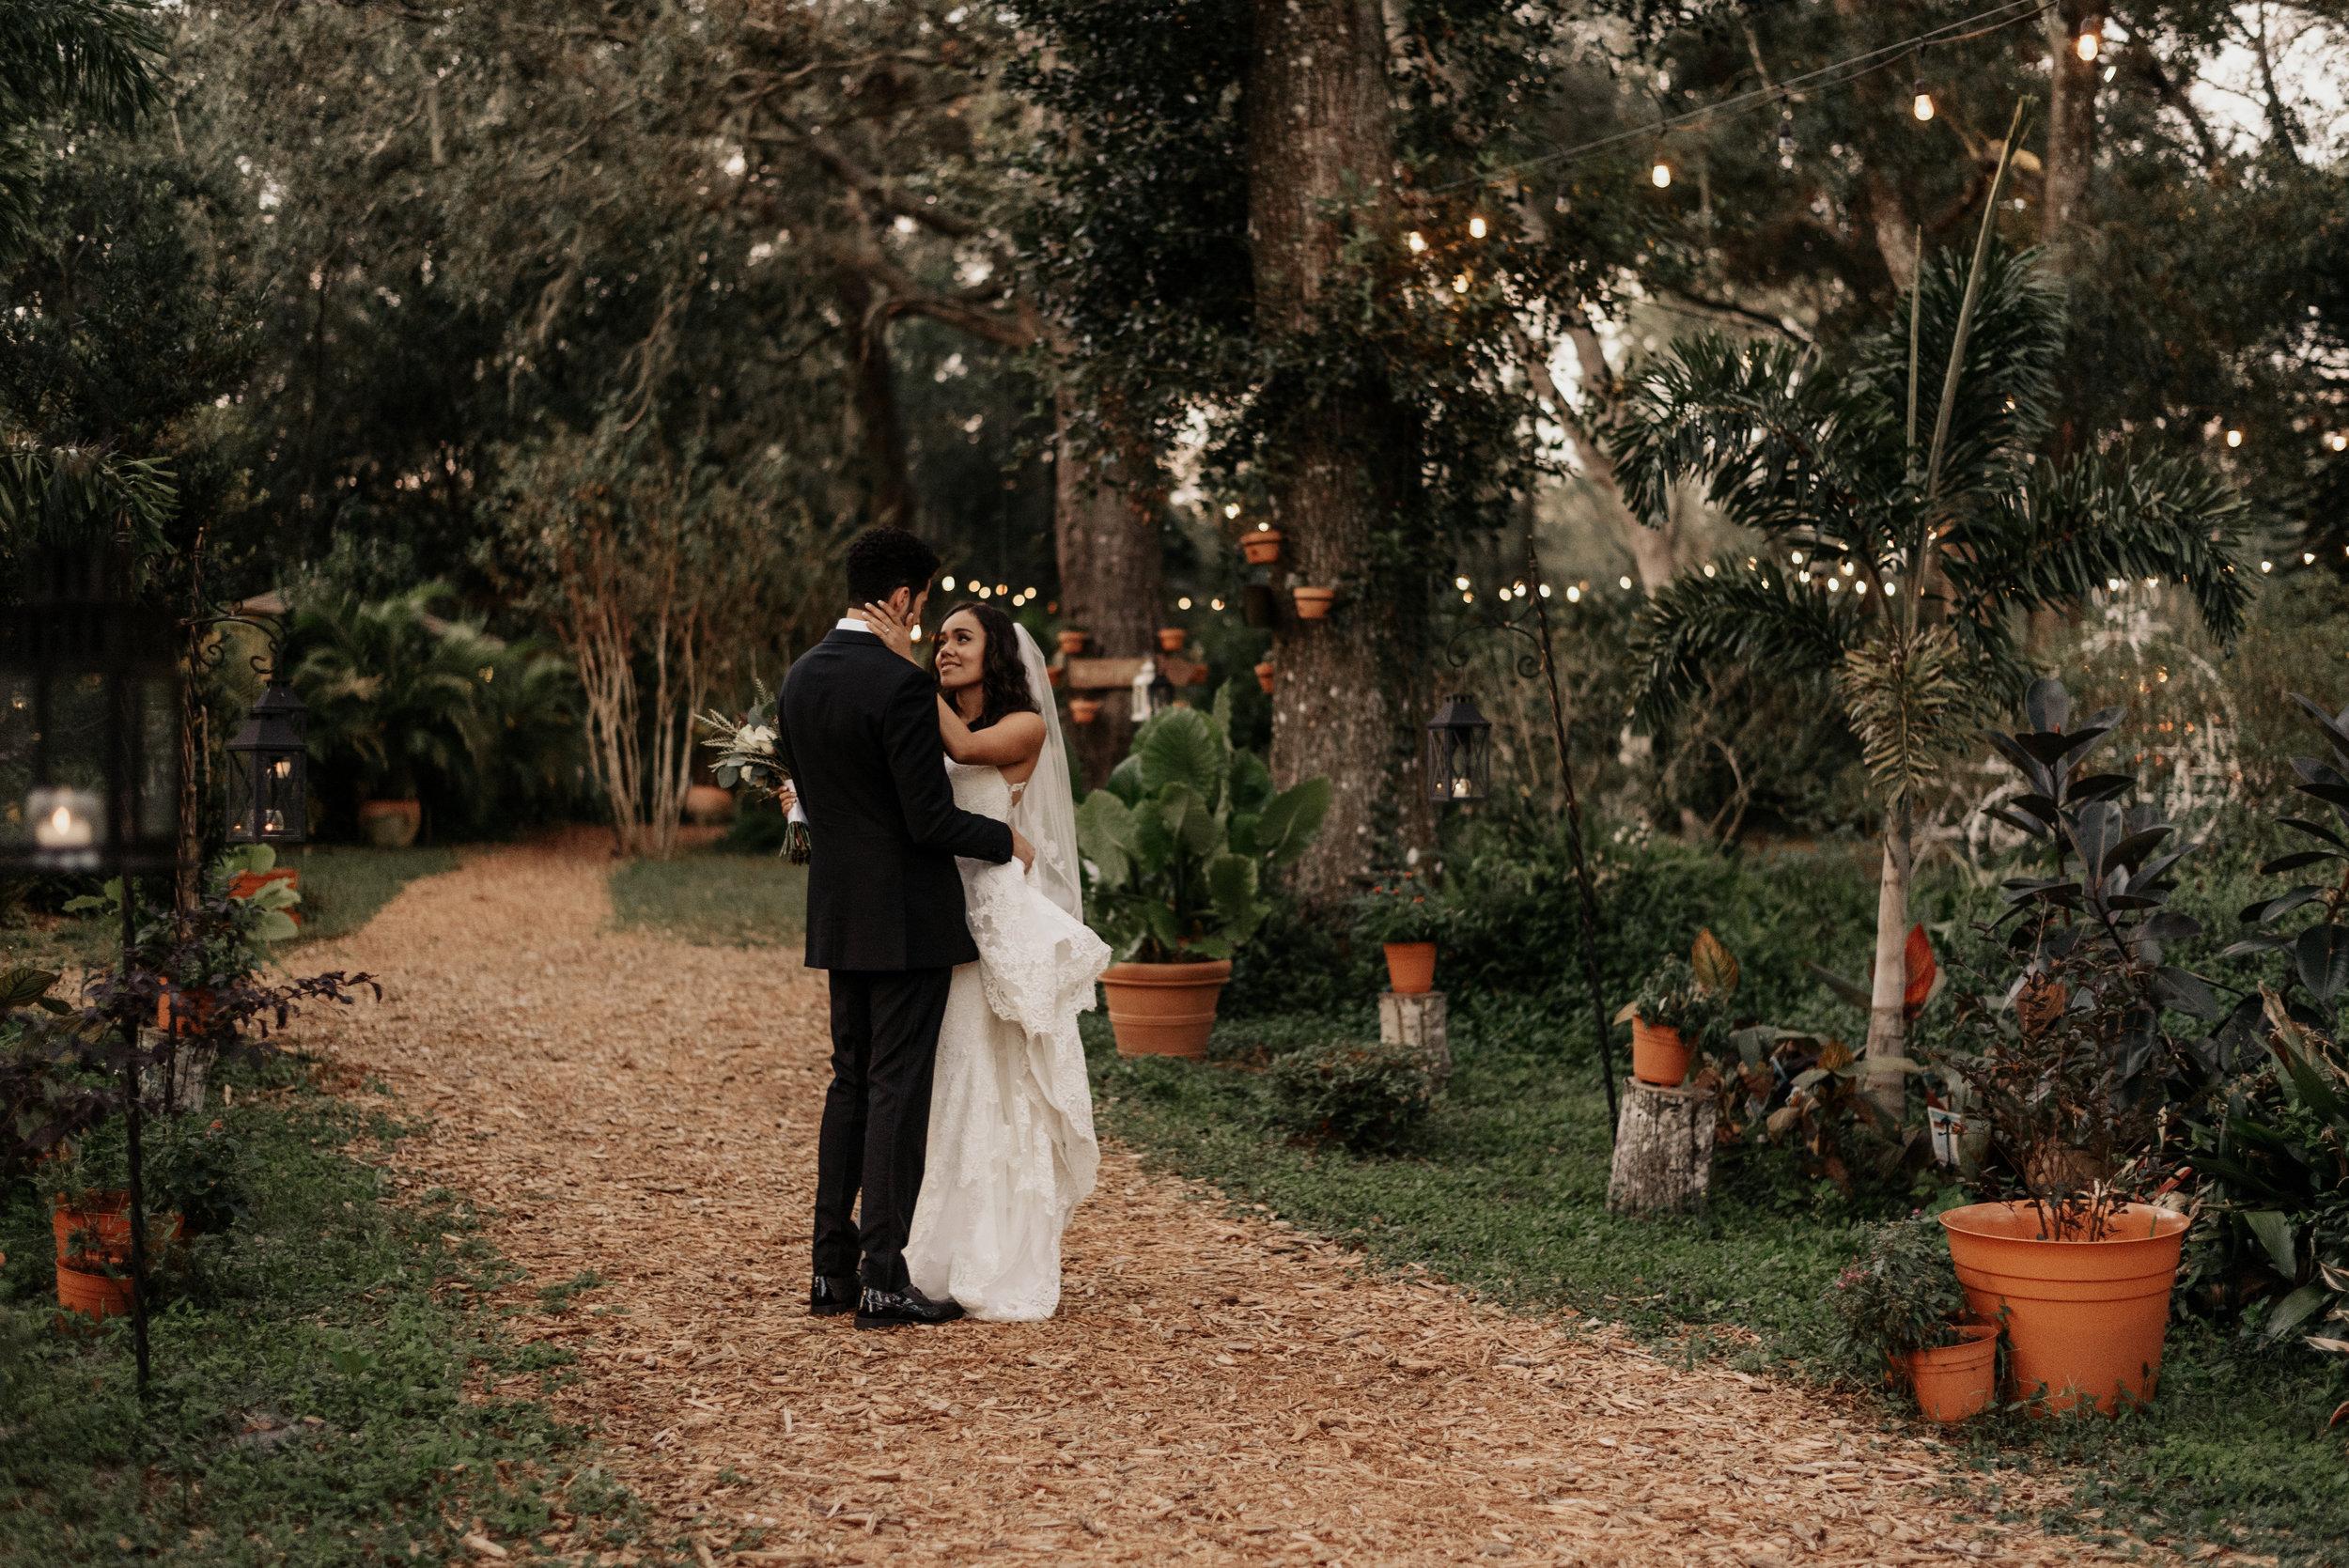 Kirstie-AJ-Wedding-9077.jpg